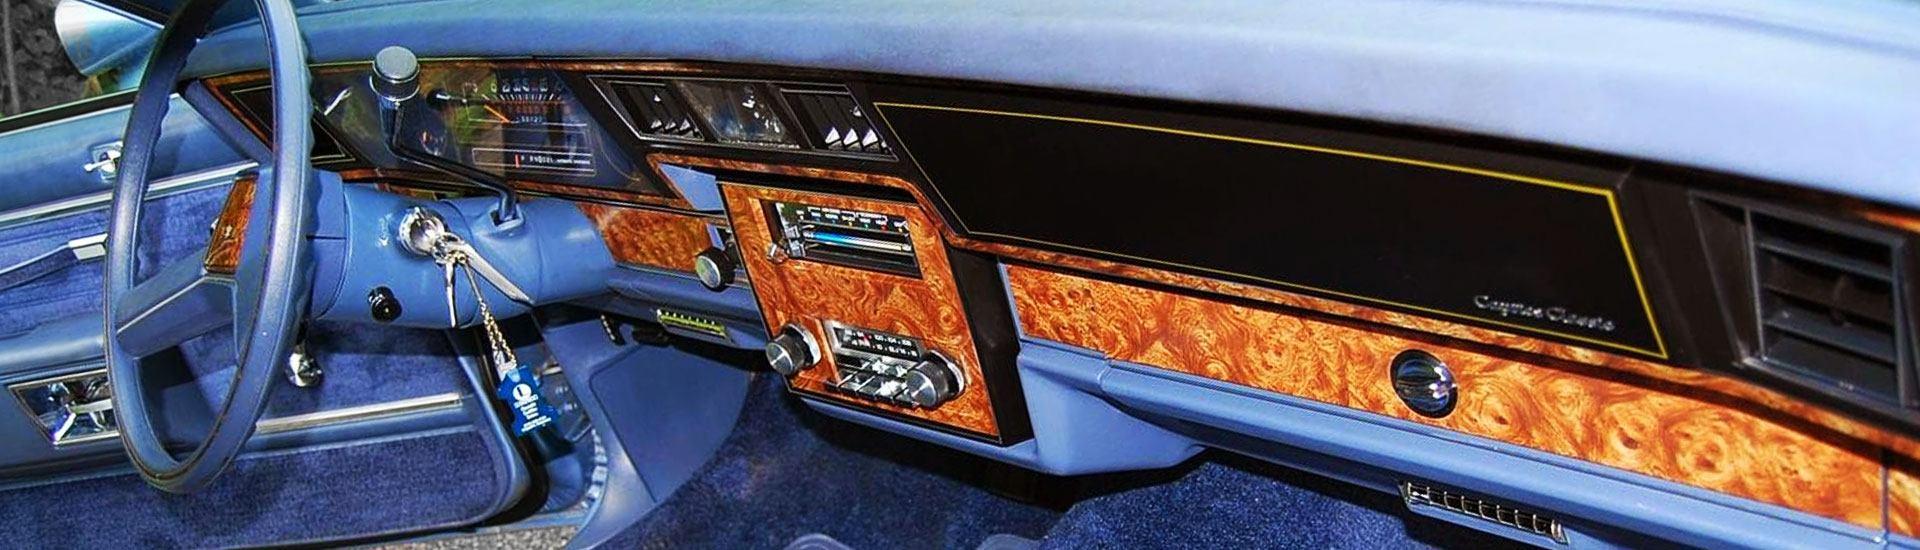 1984 Chevrolet Caprice Dash Kits Custom 1984 Chevrolet